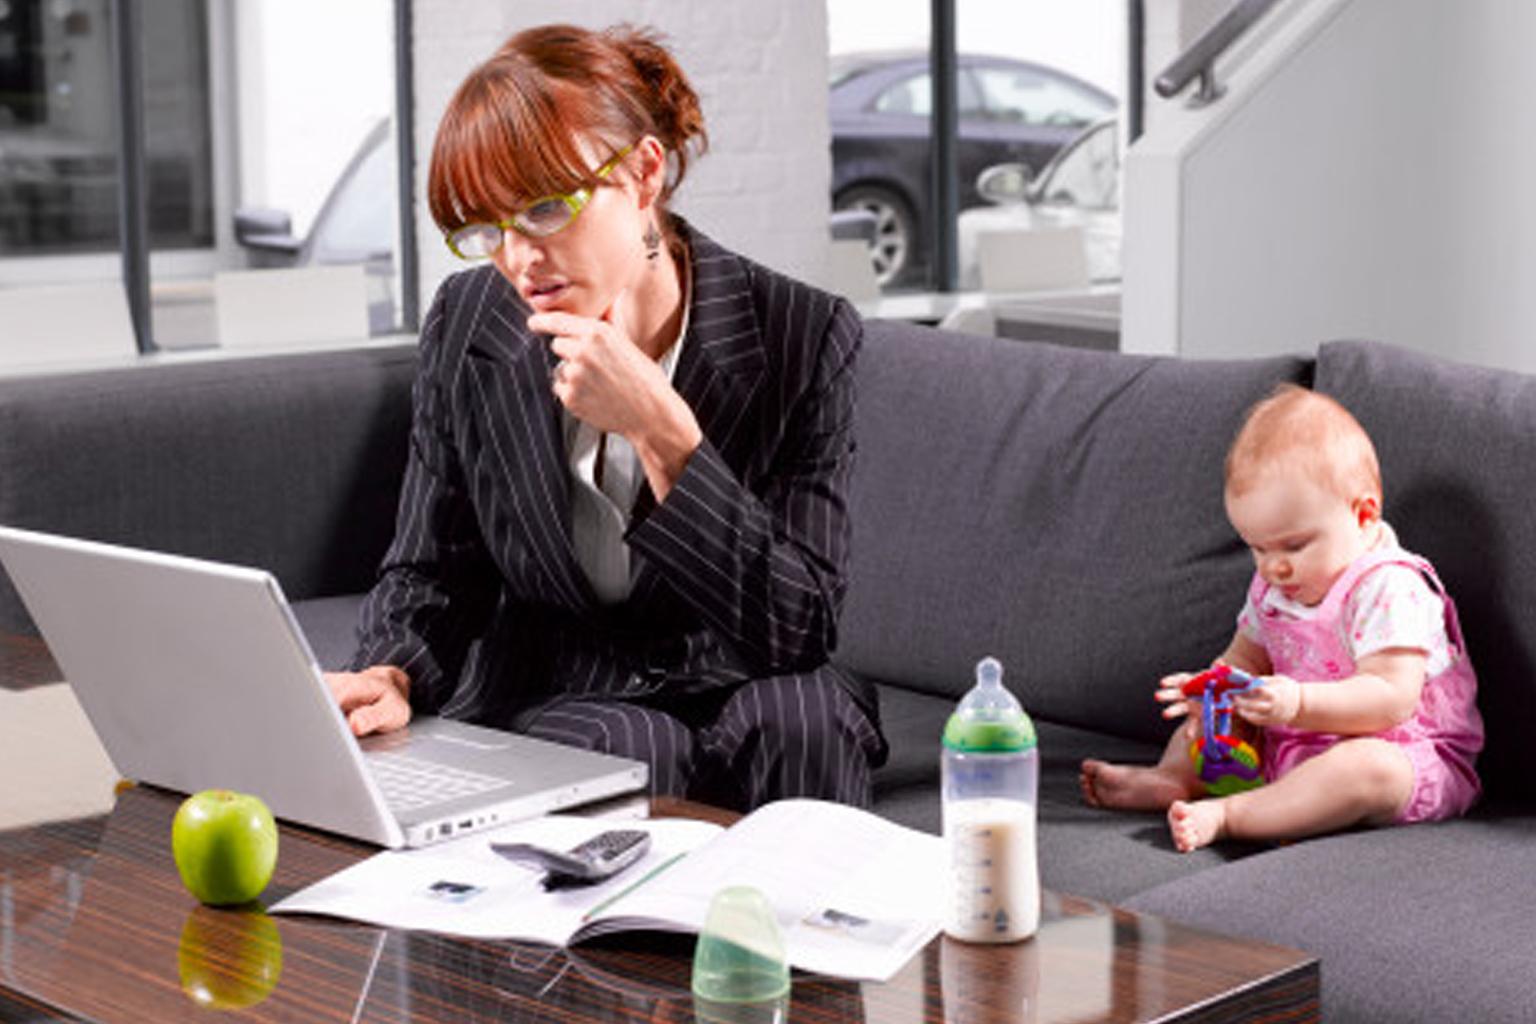 travail a domicile que choisir